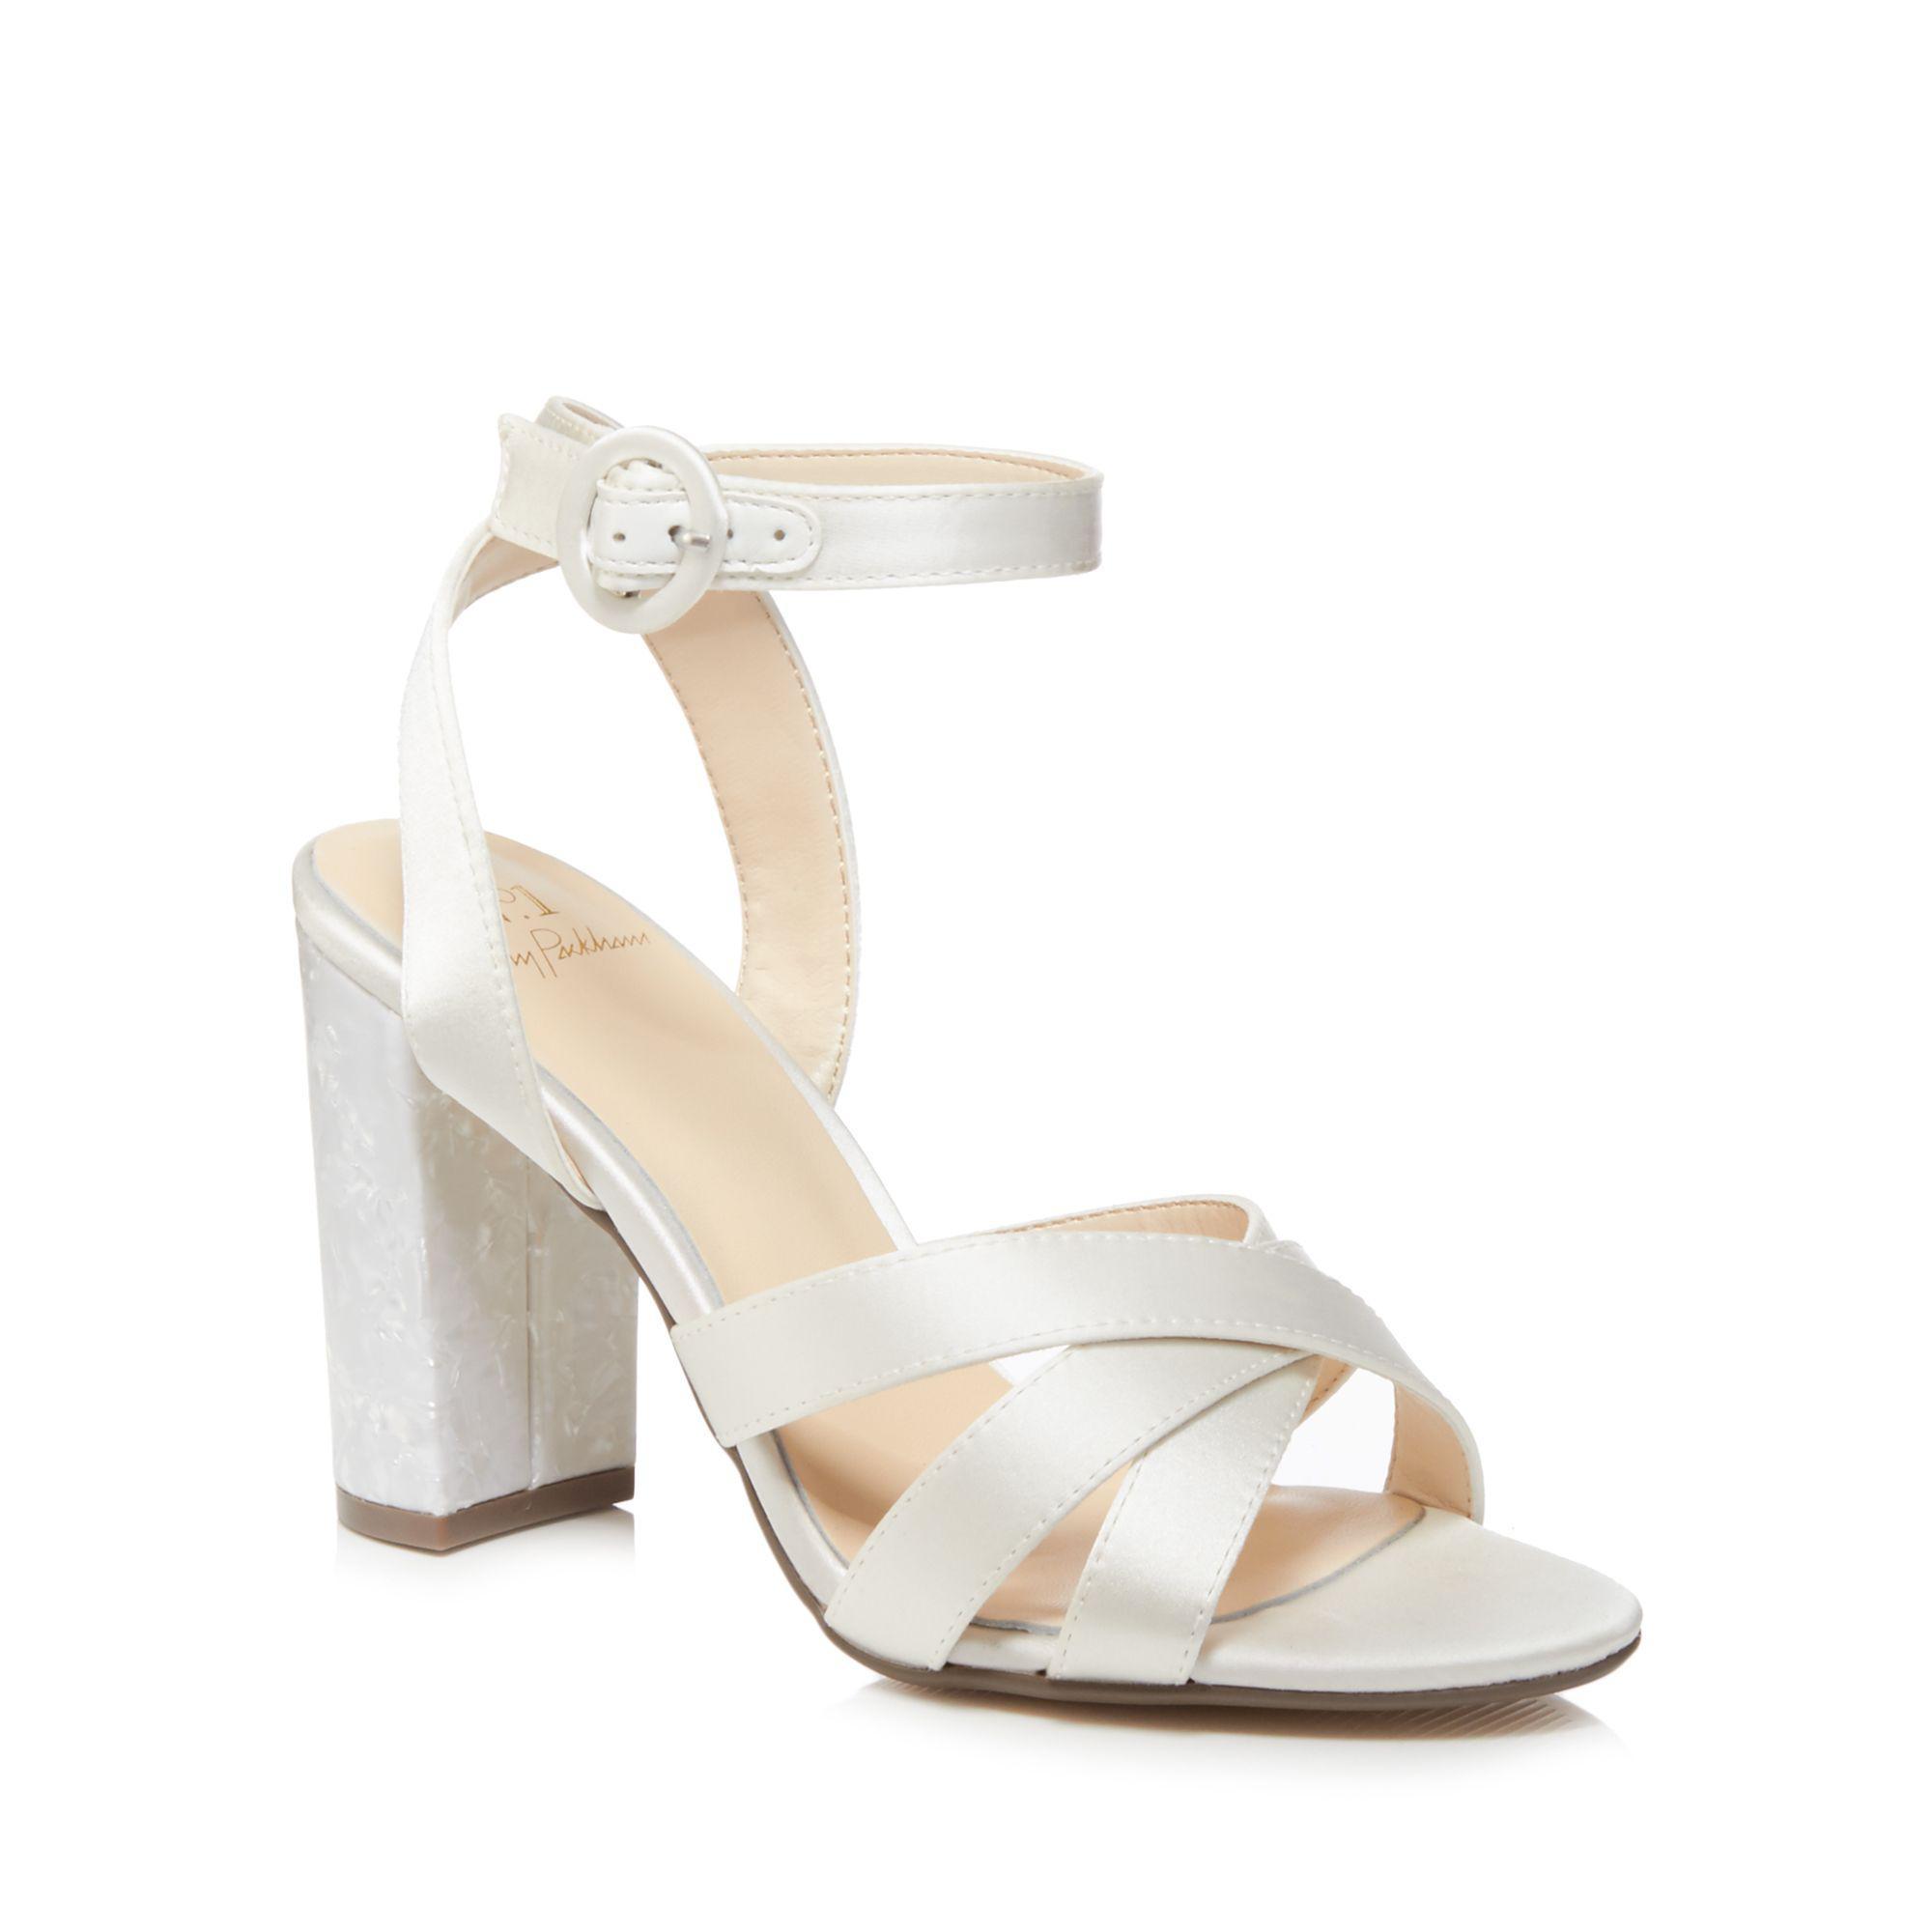 fc90d62076e Jenny Packham. Women s White Ivory Satin  pearl  High Block Heel Ankle  Strap Sandals